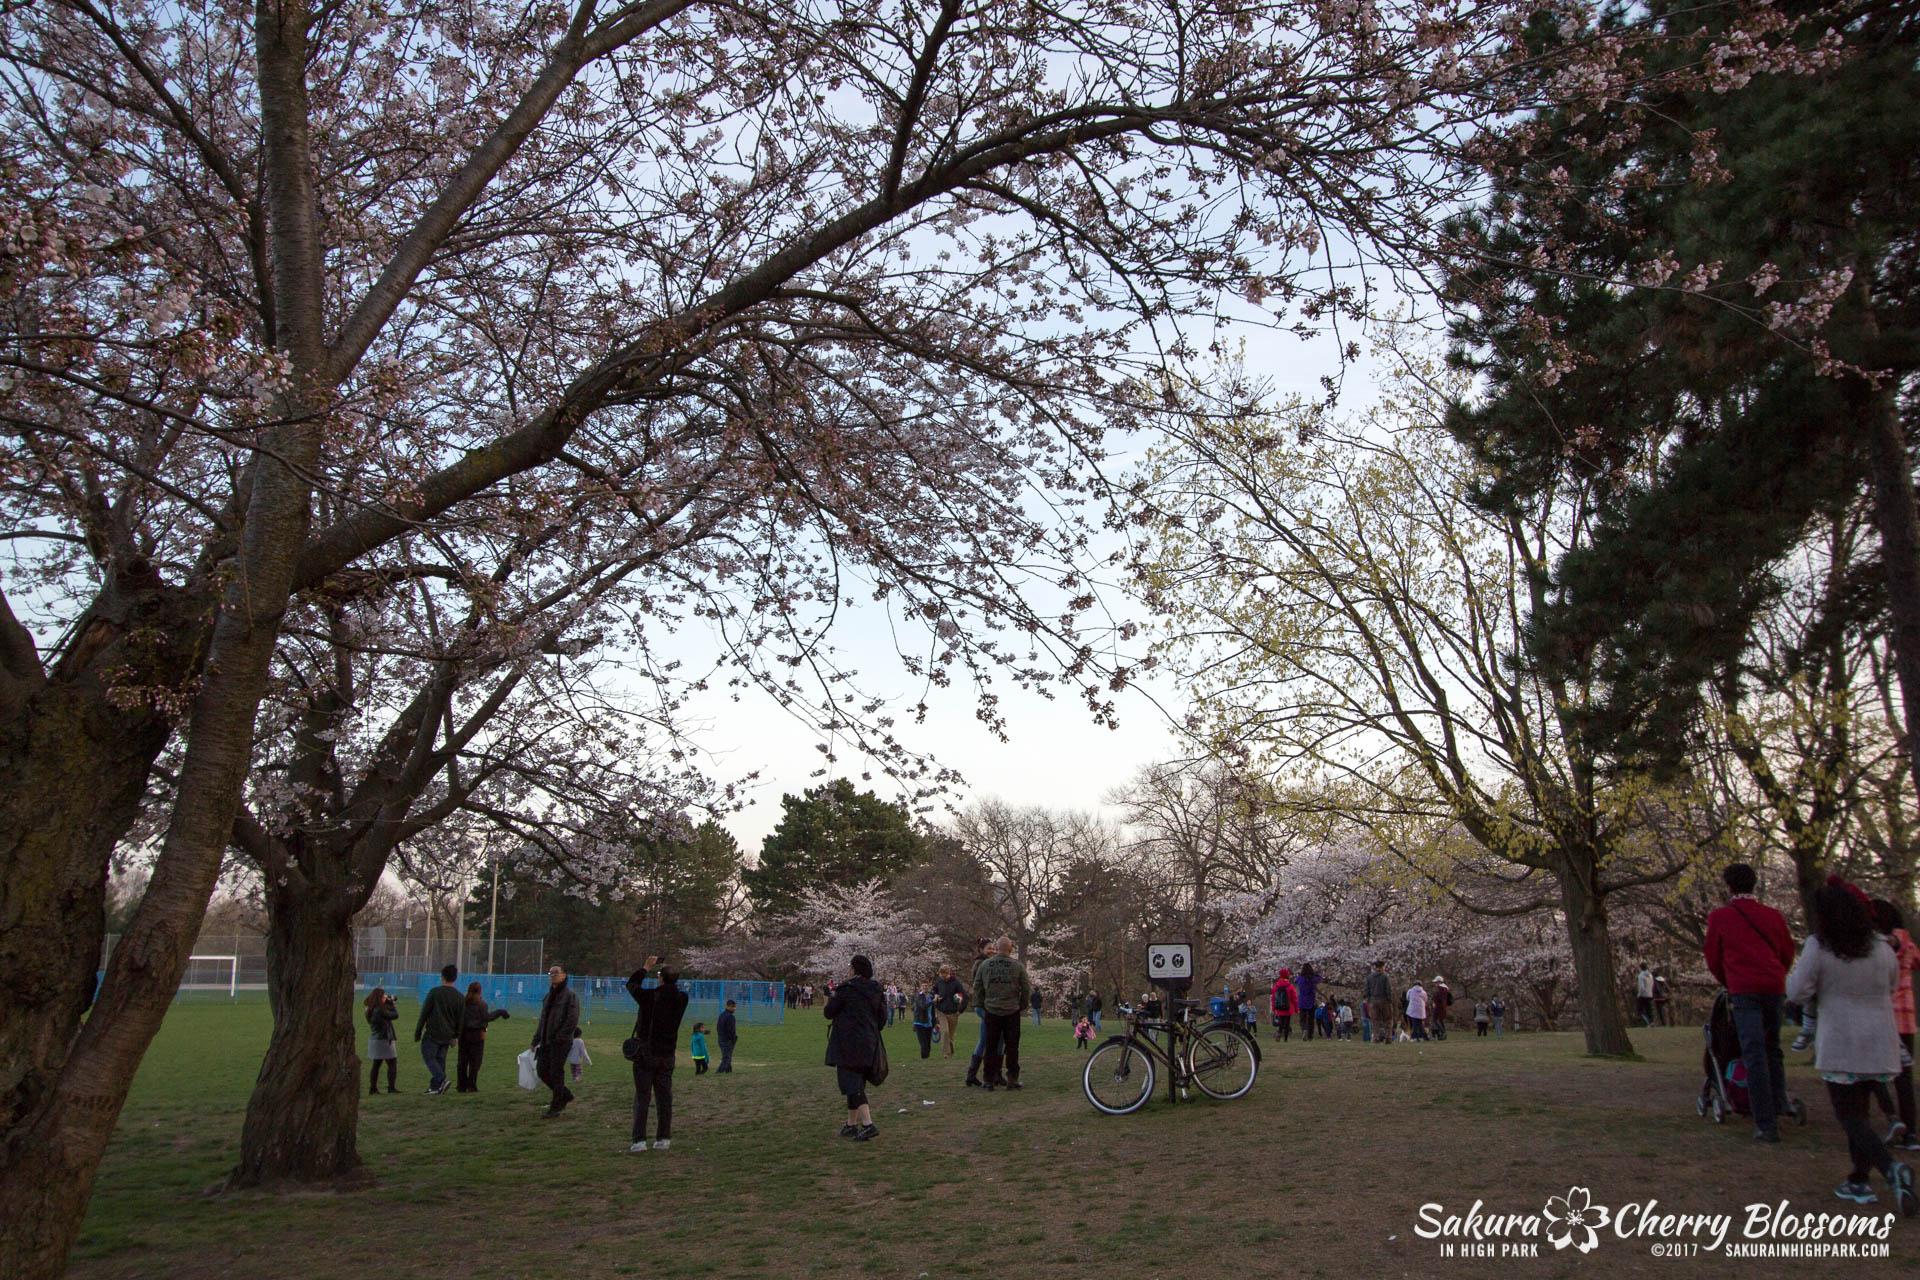 Sakura-Watch-April-24-2017-bloom-has-begun-with-more-to-come-228.jpg